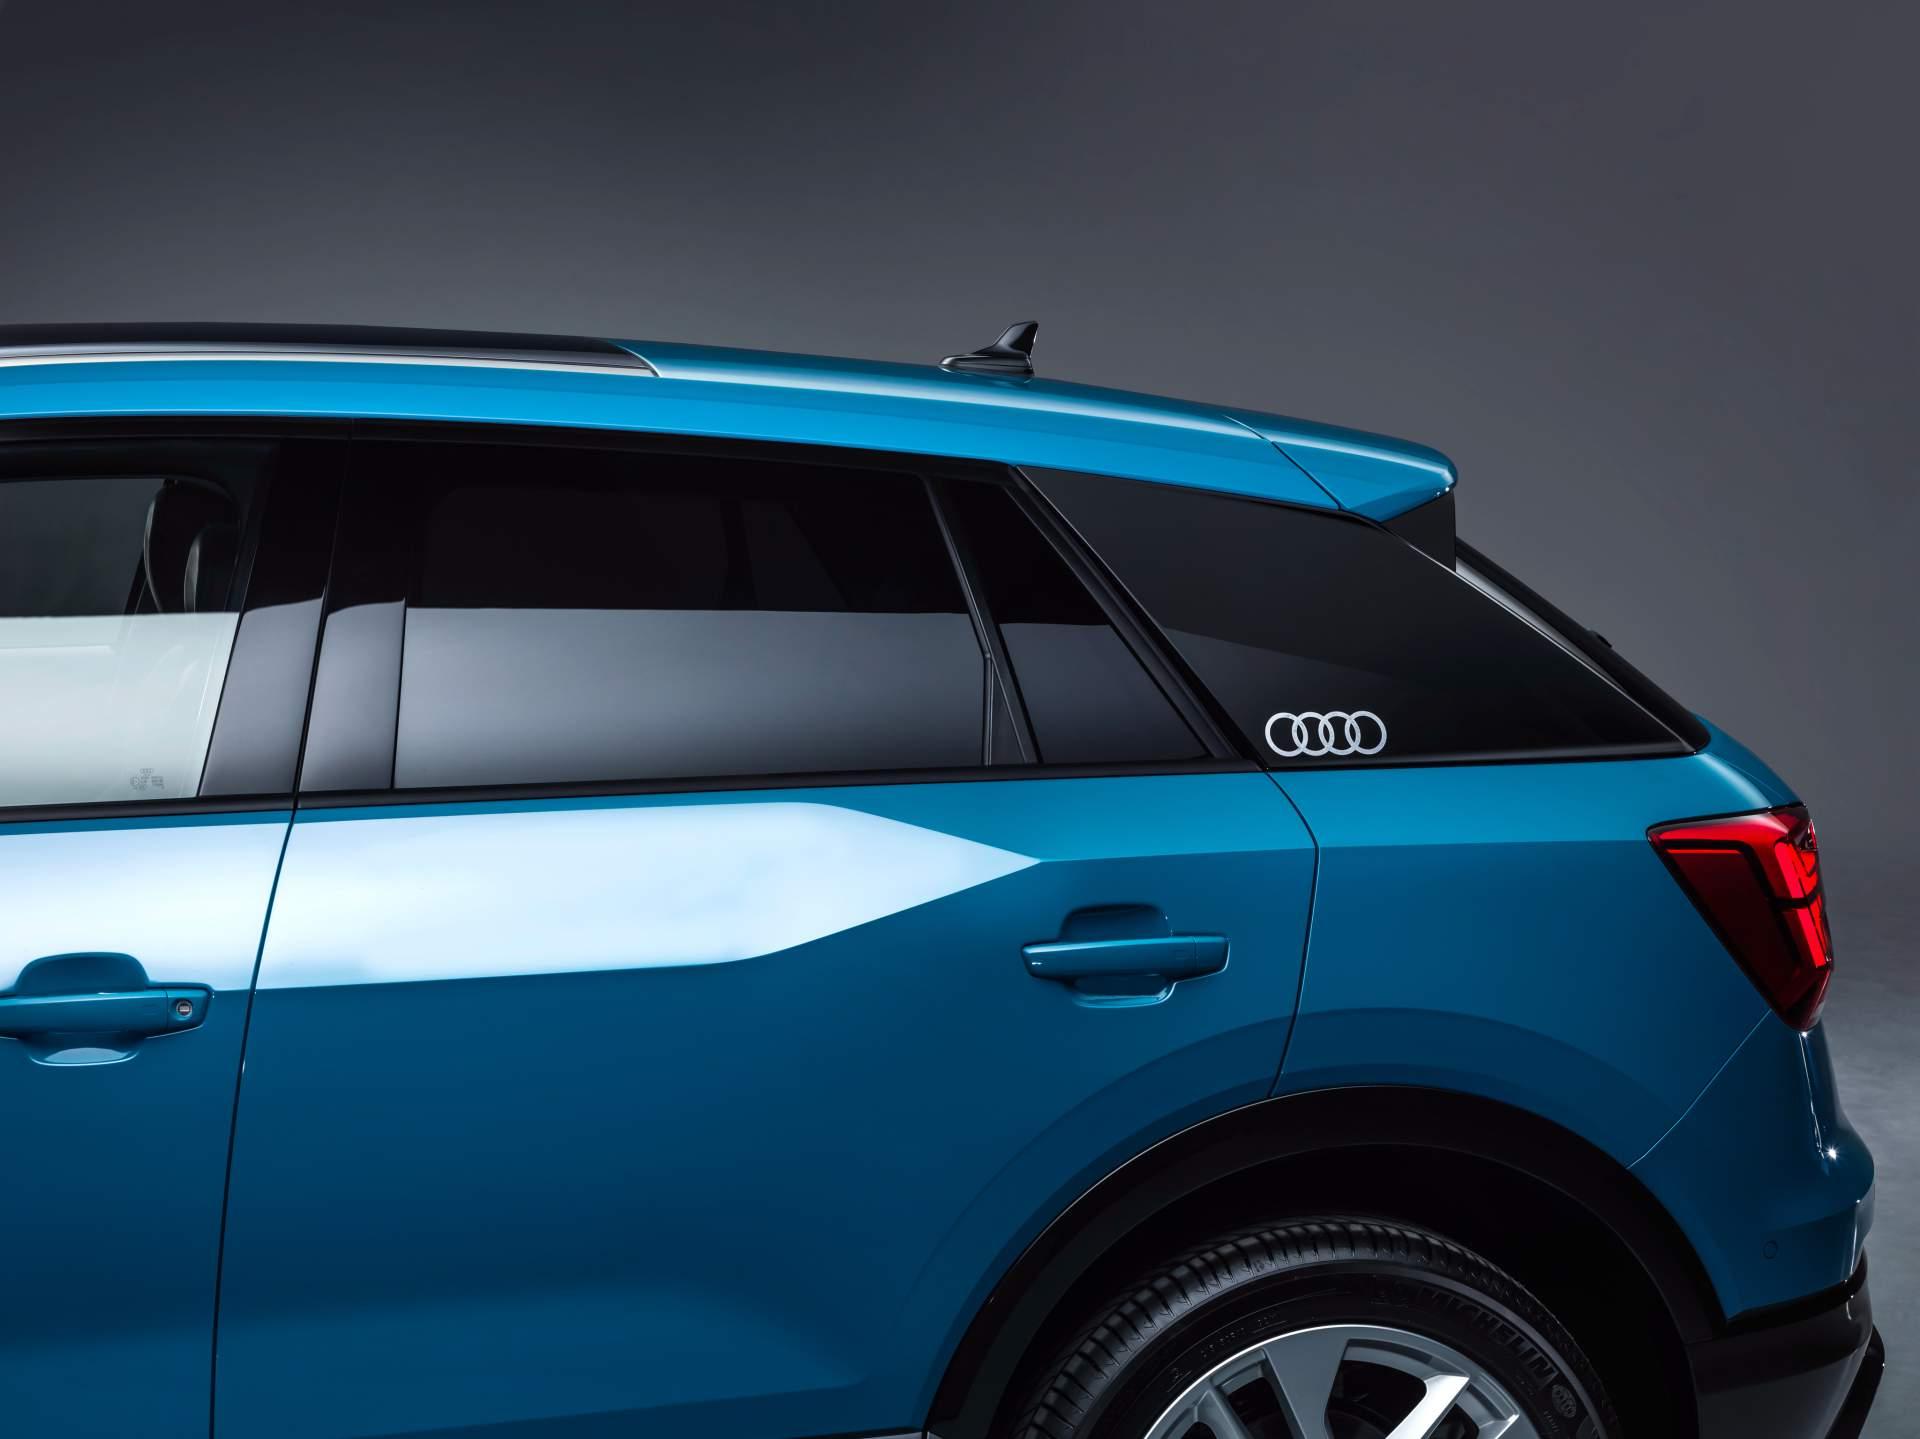 Audi_Q2_L_0042